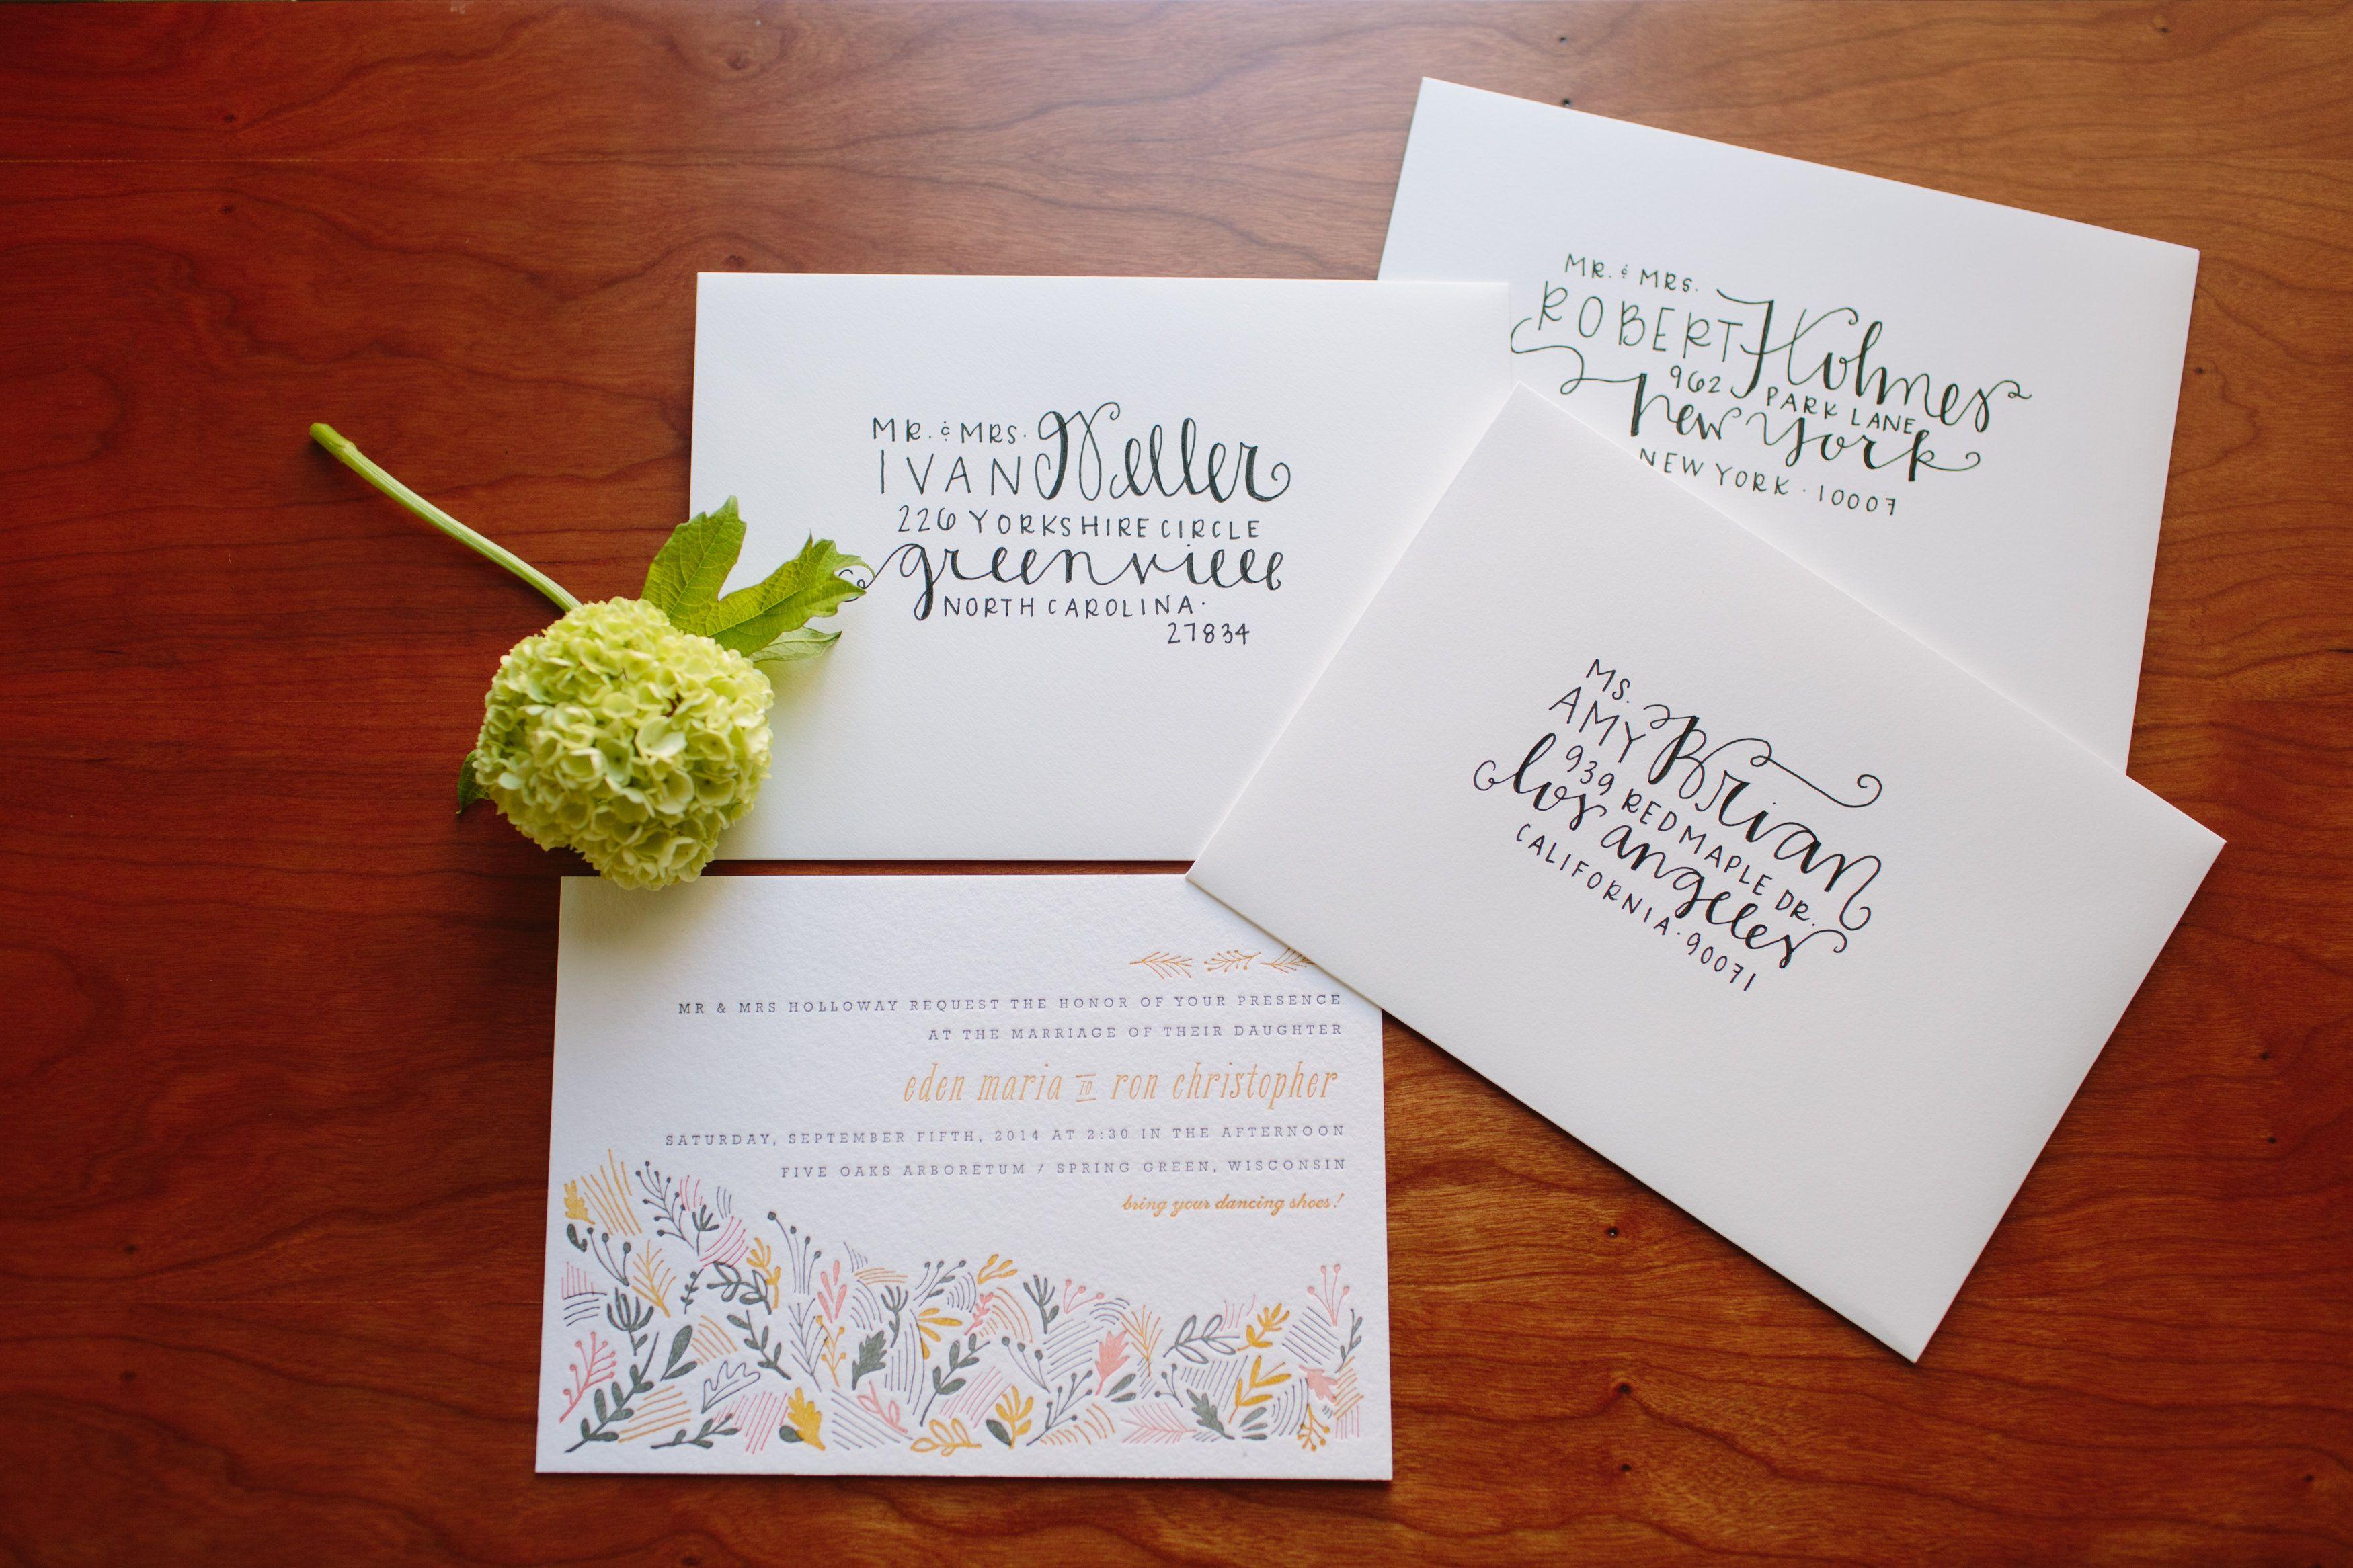 DIY Wedding Envelope Addressing Tips by lizstan